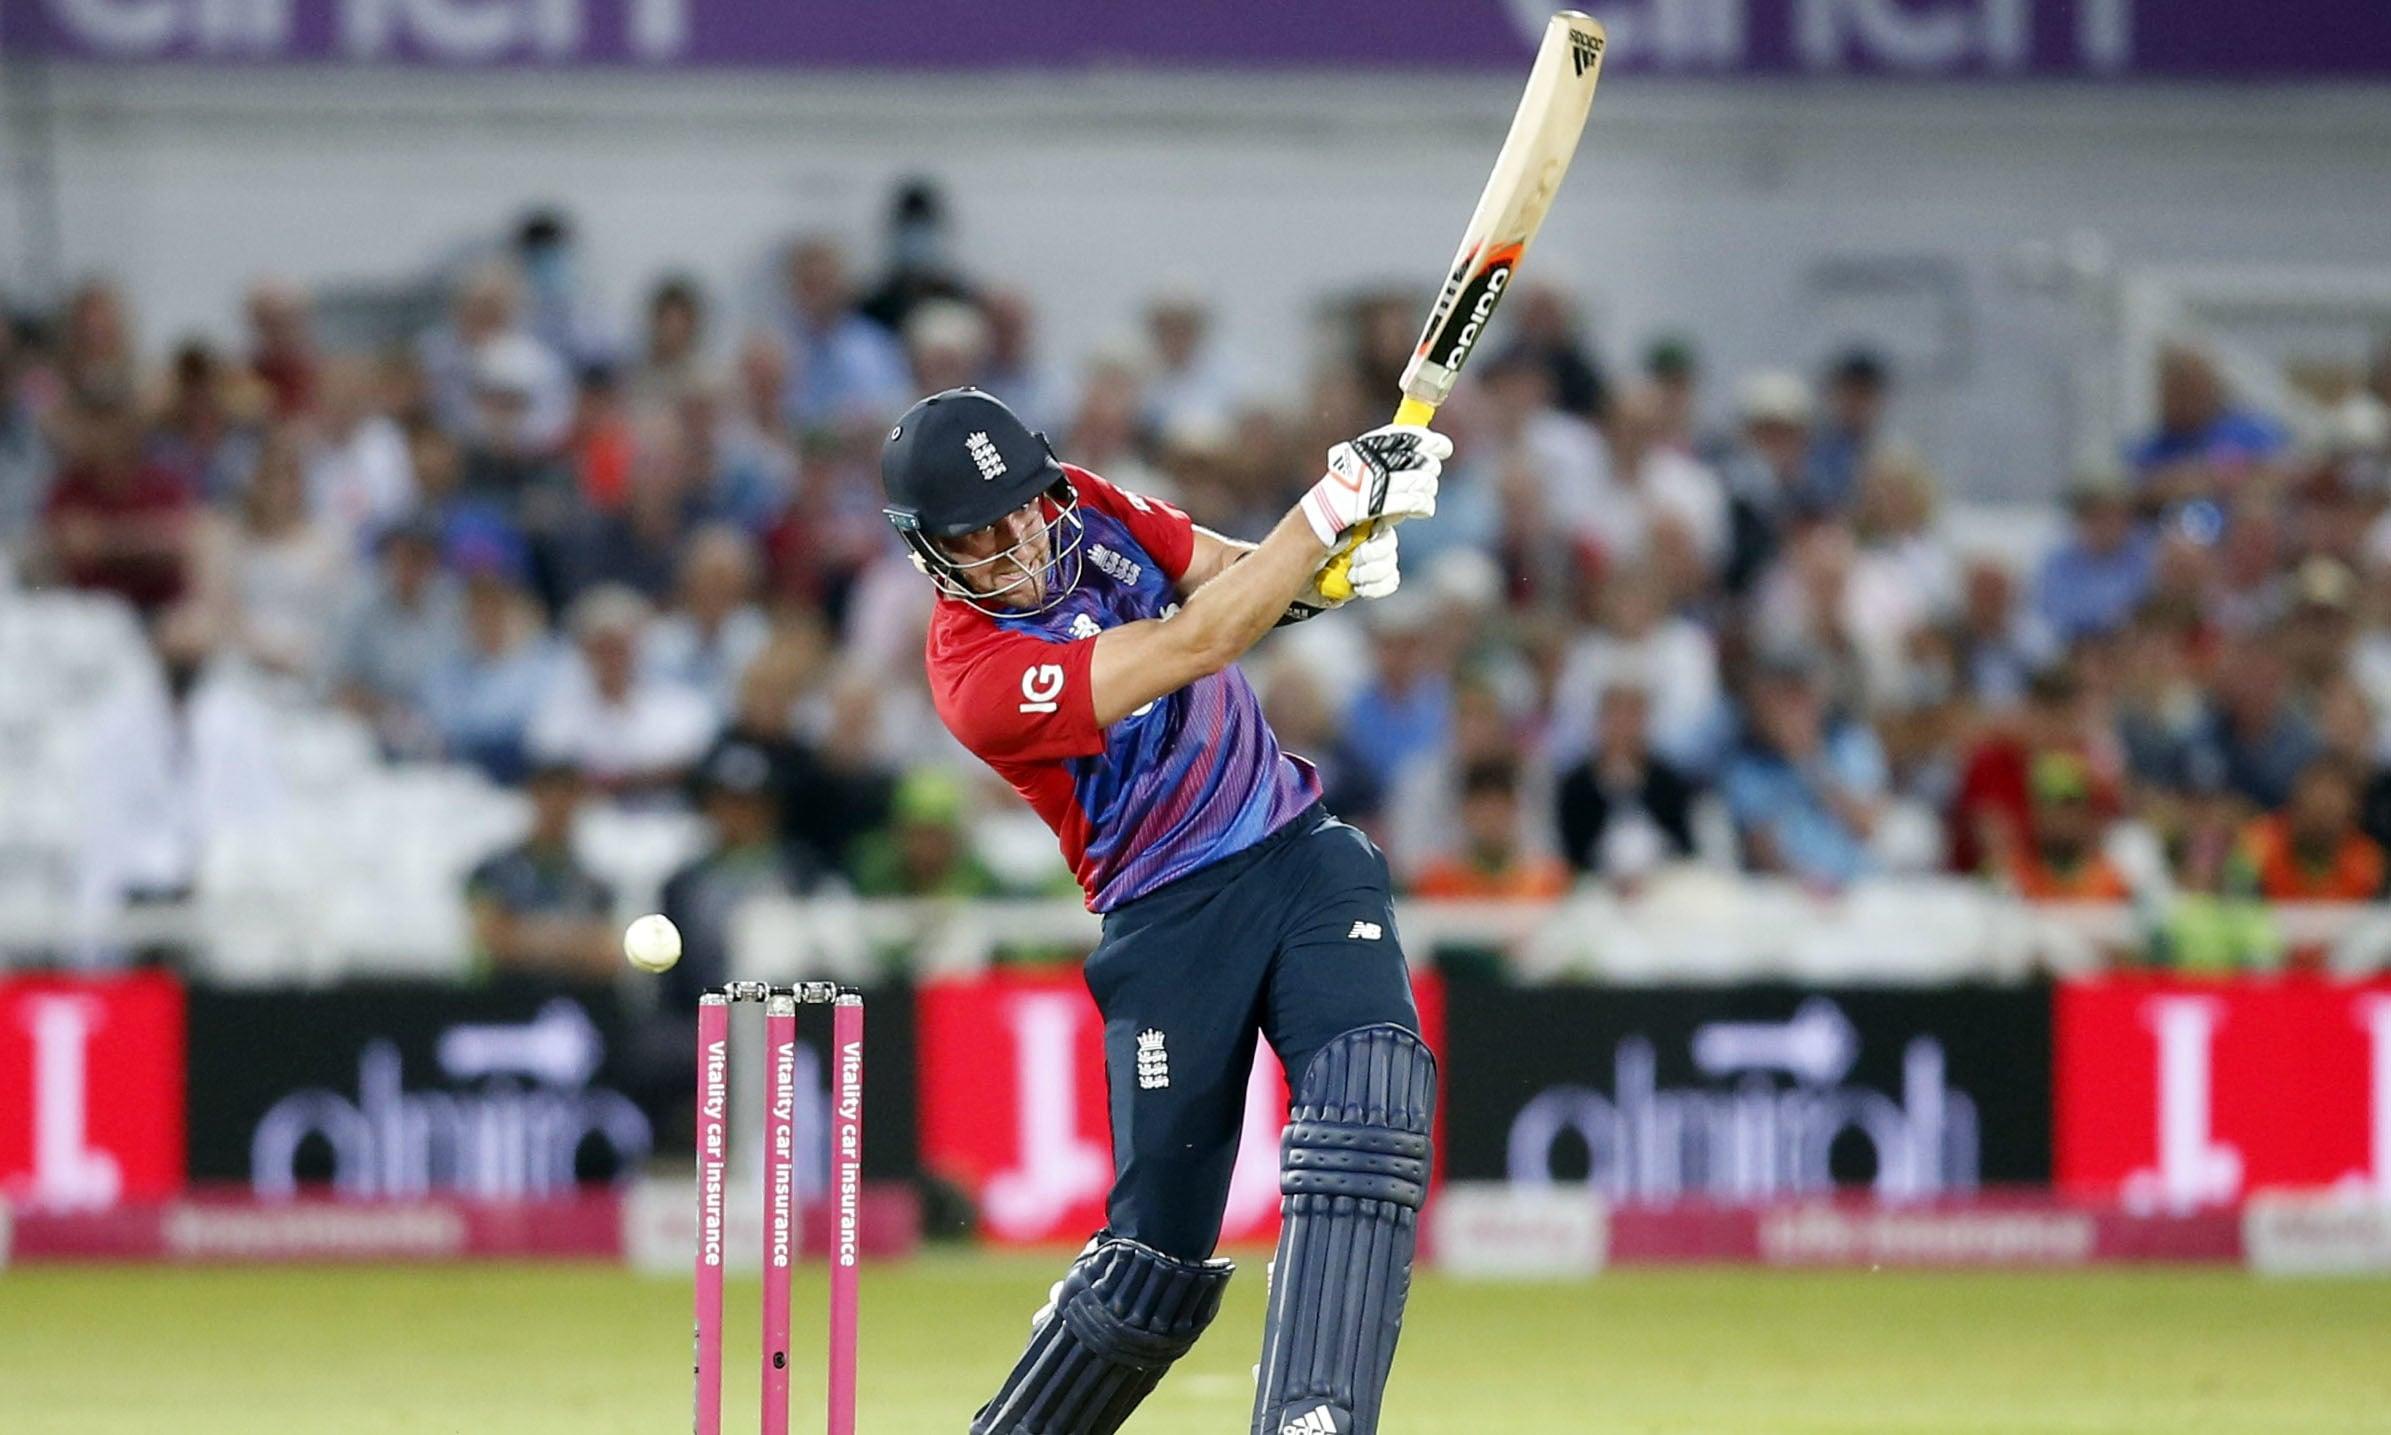 England's Liam Livingstone in action against Pakistan. — Reuters/File